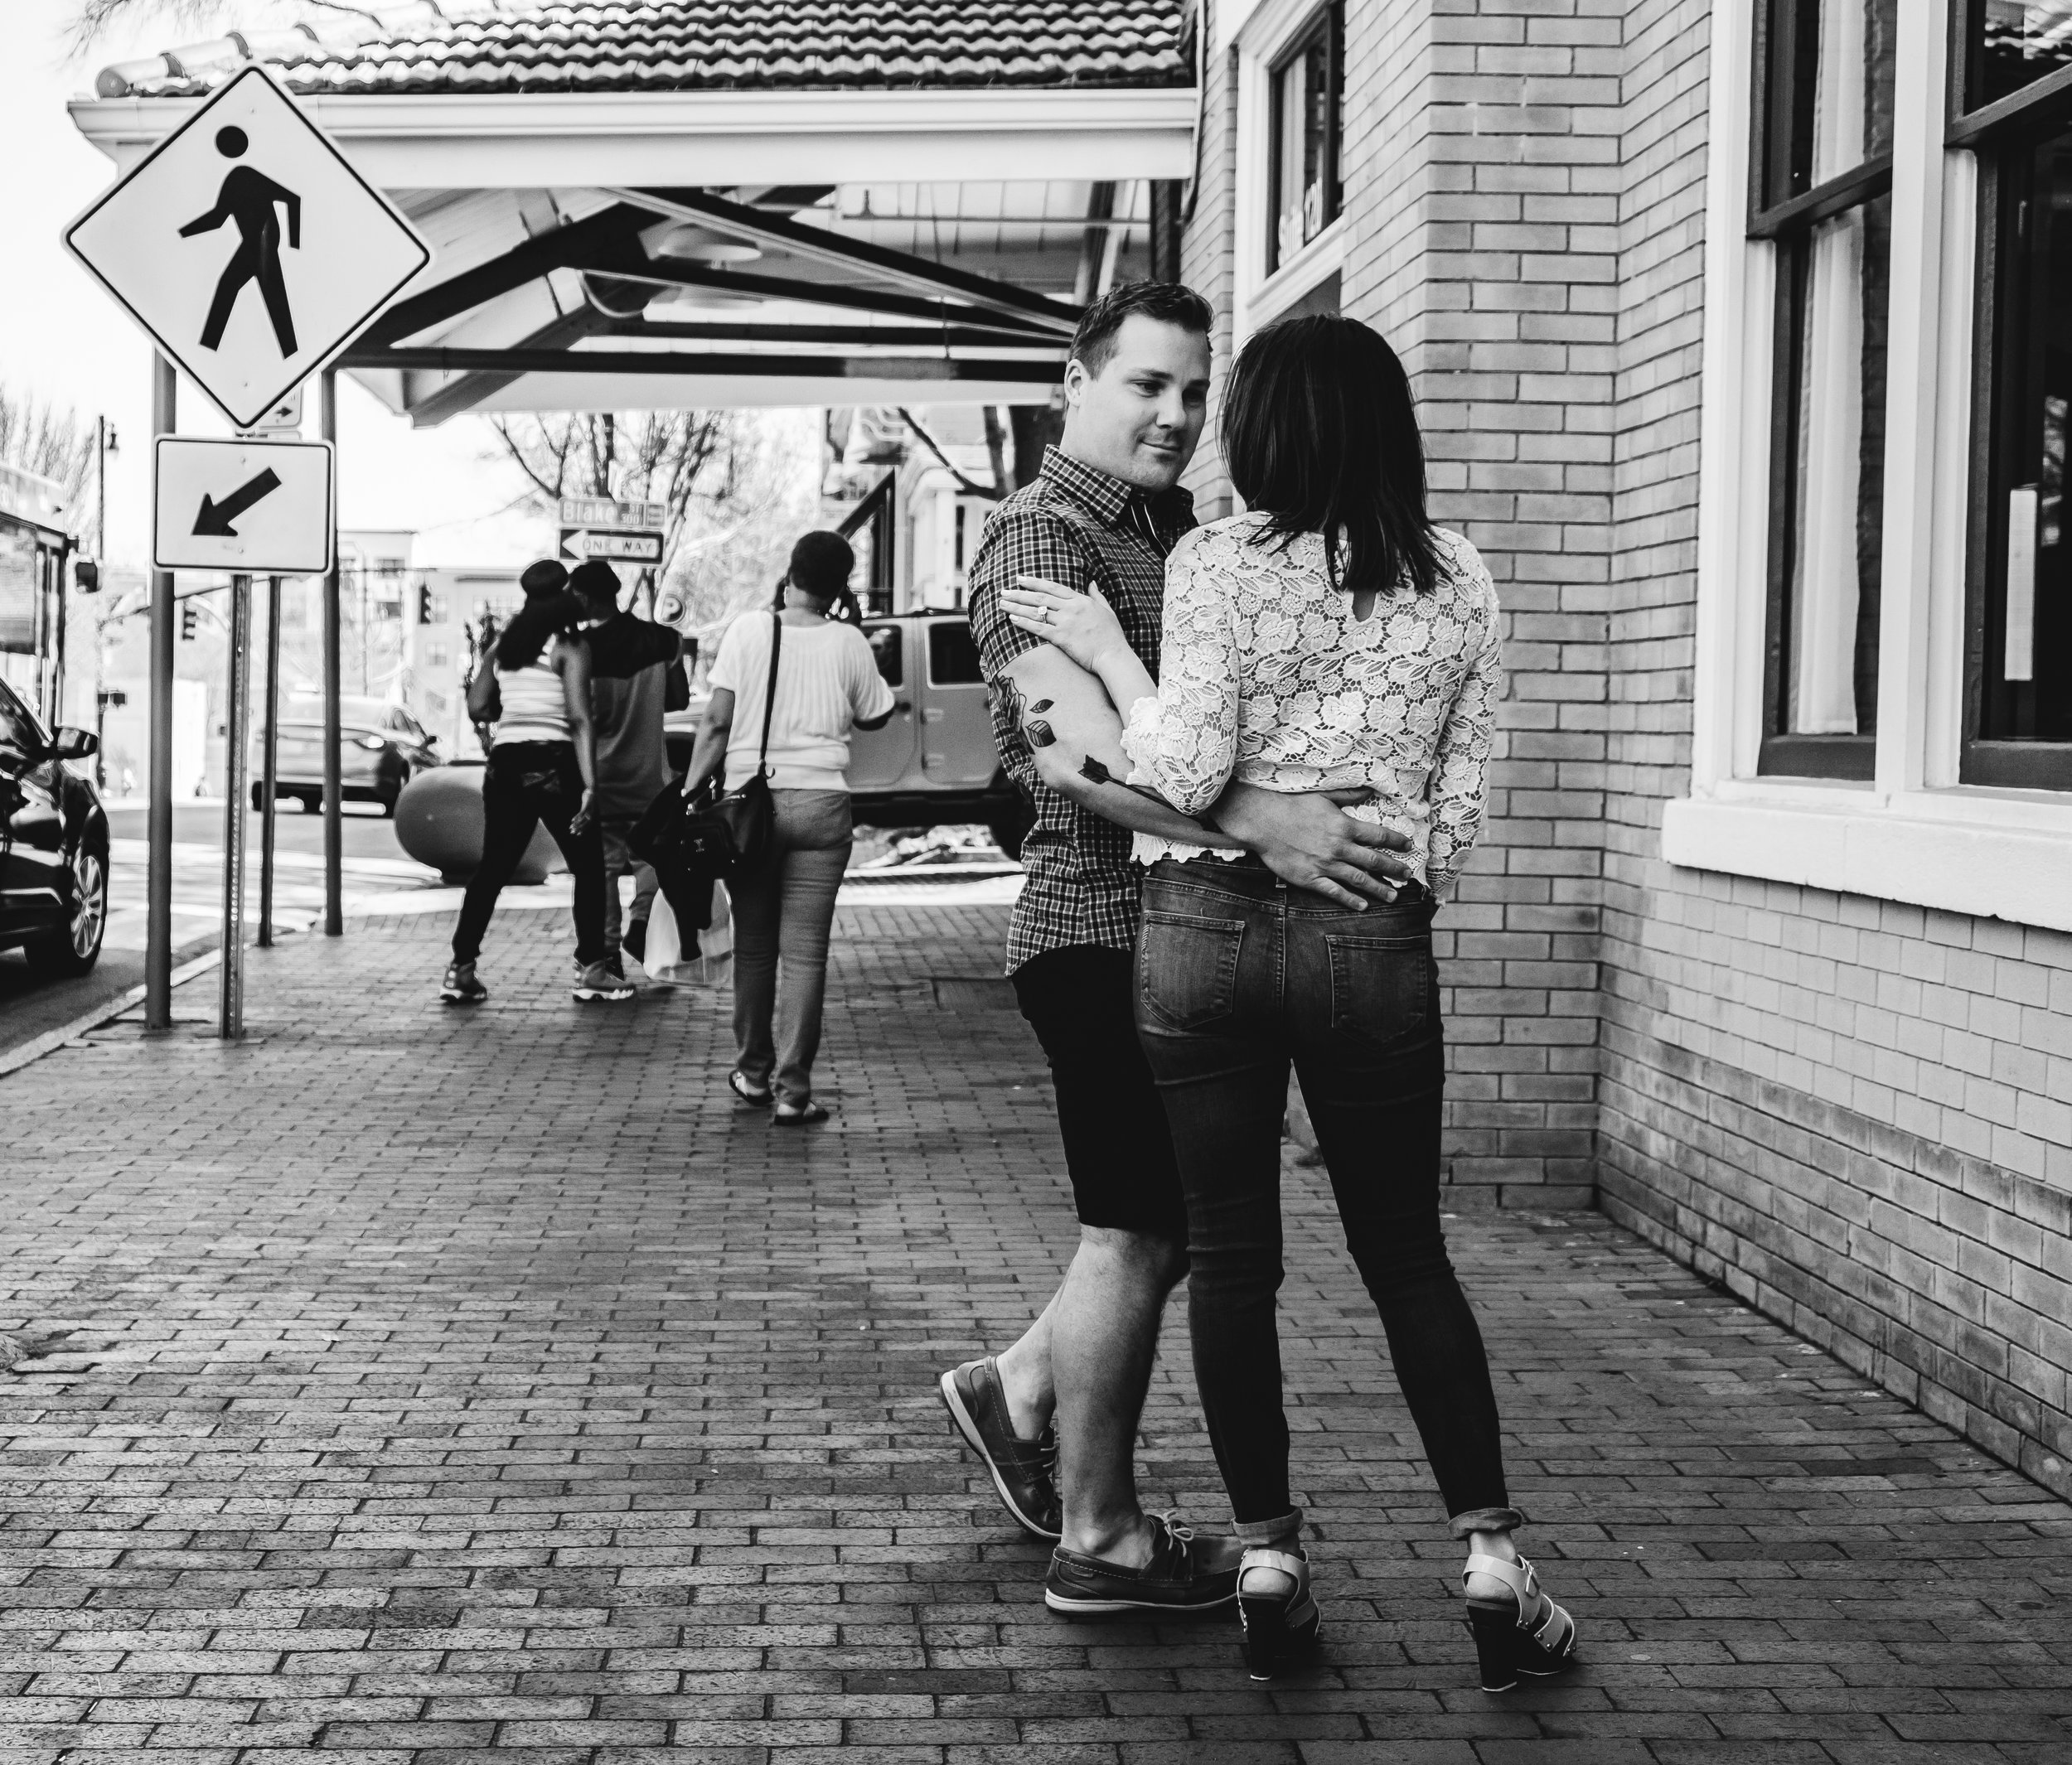 Just dancing on the sidewalk... No big deal!